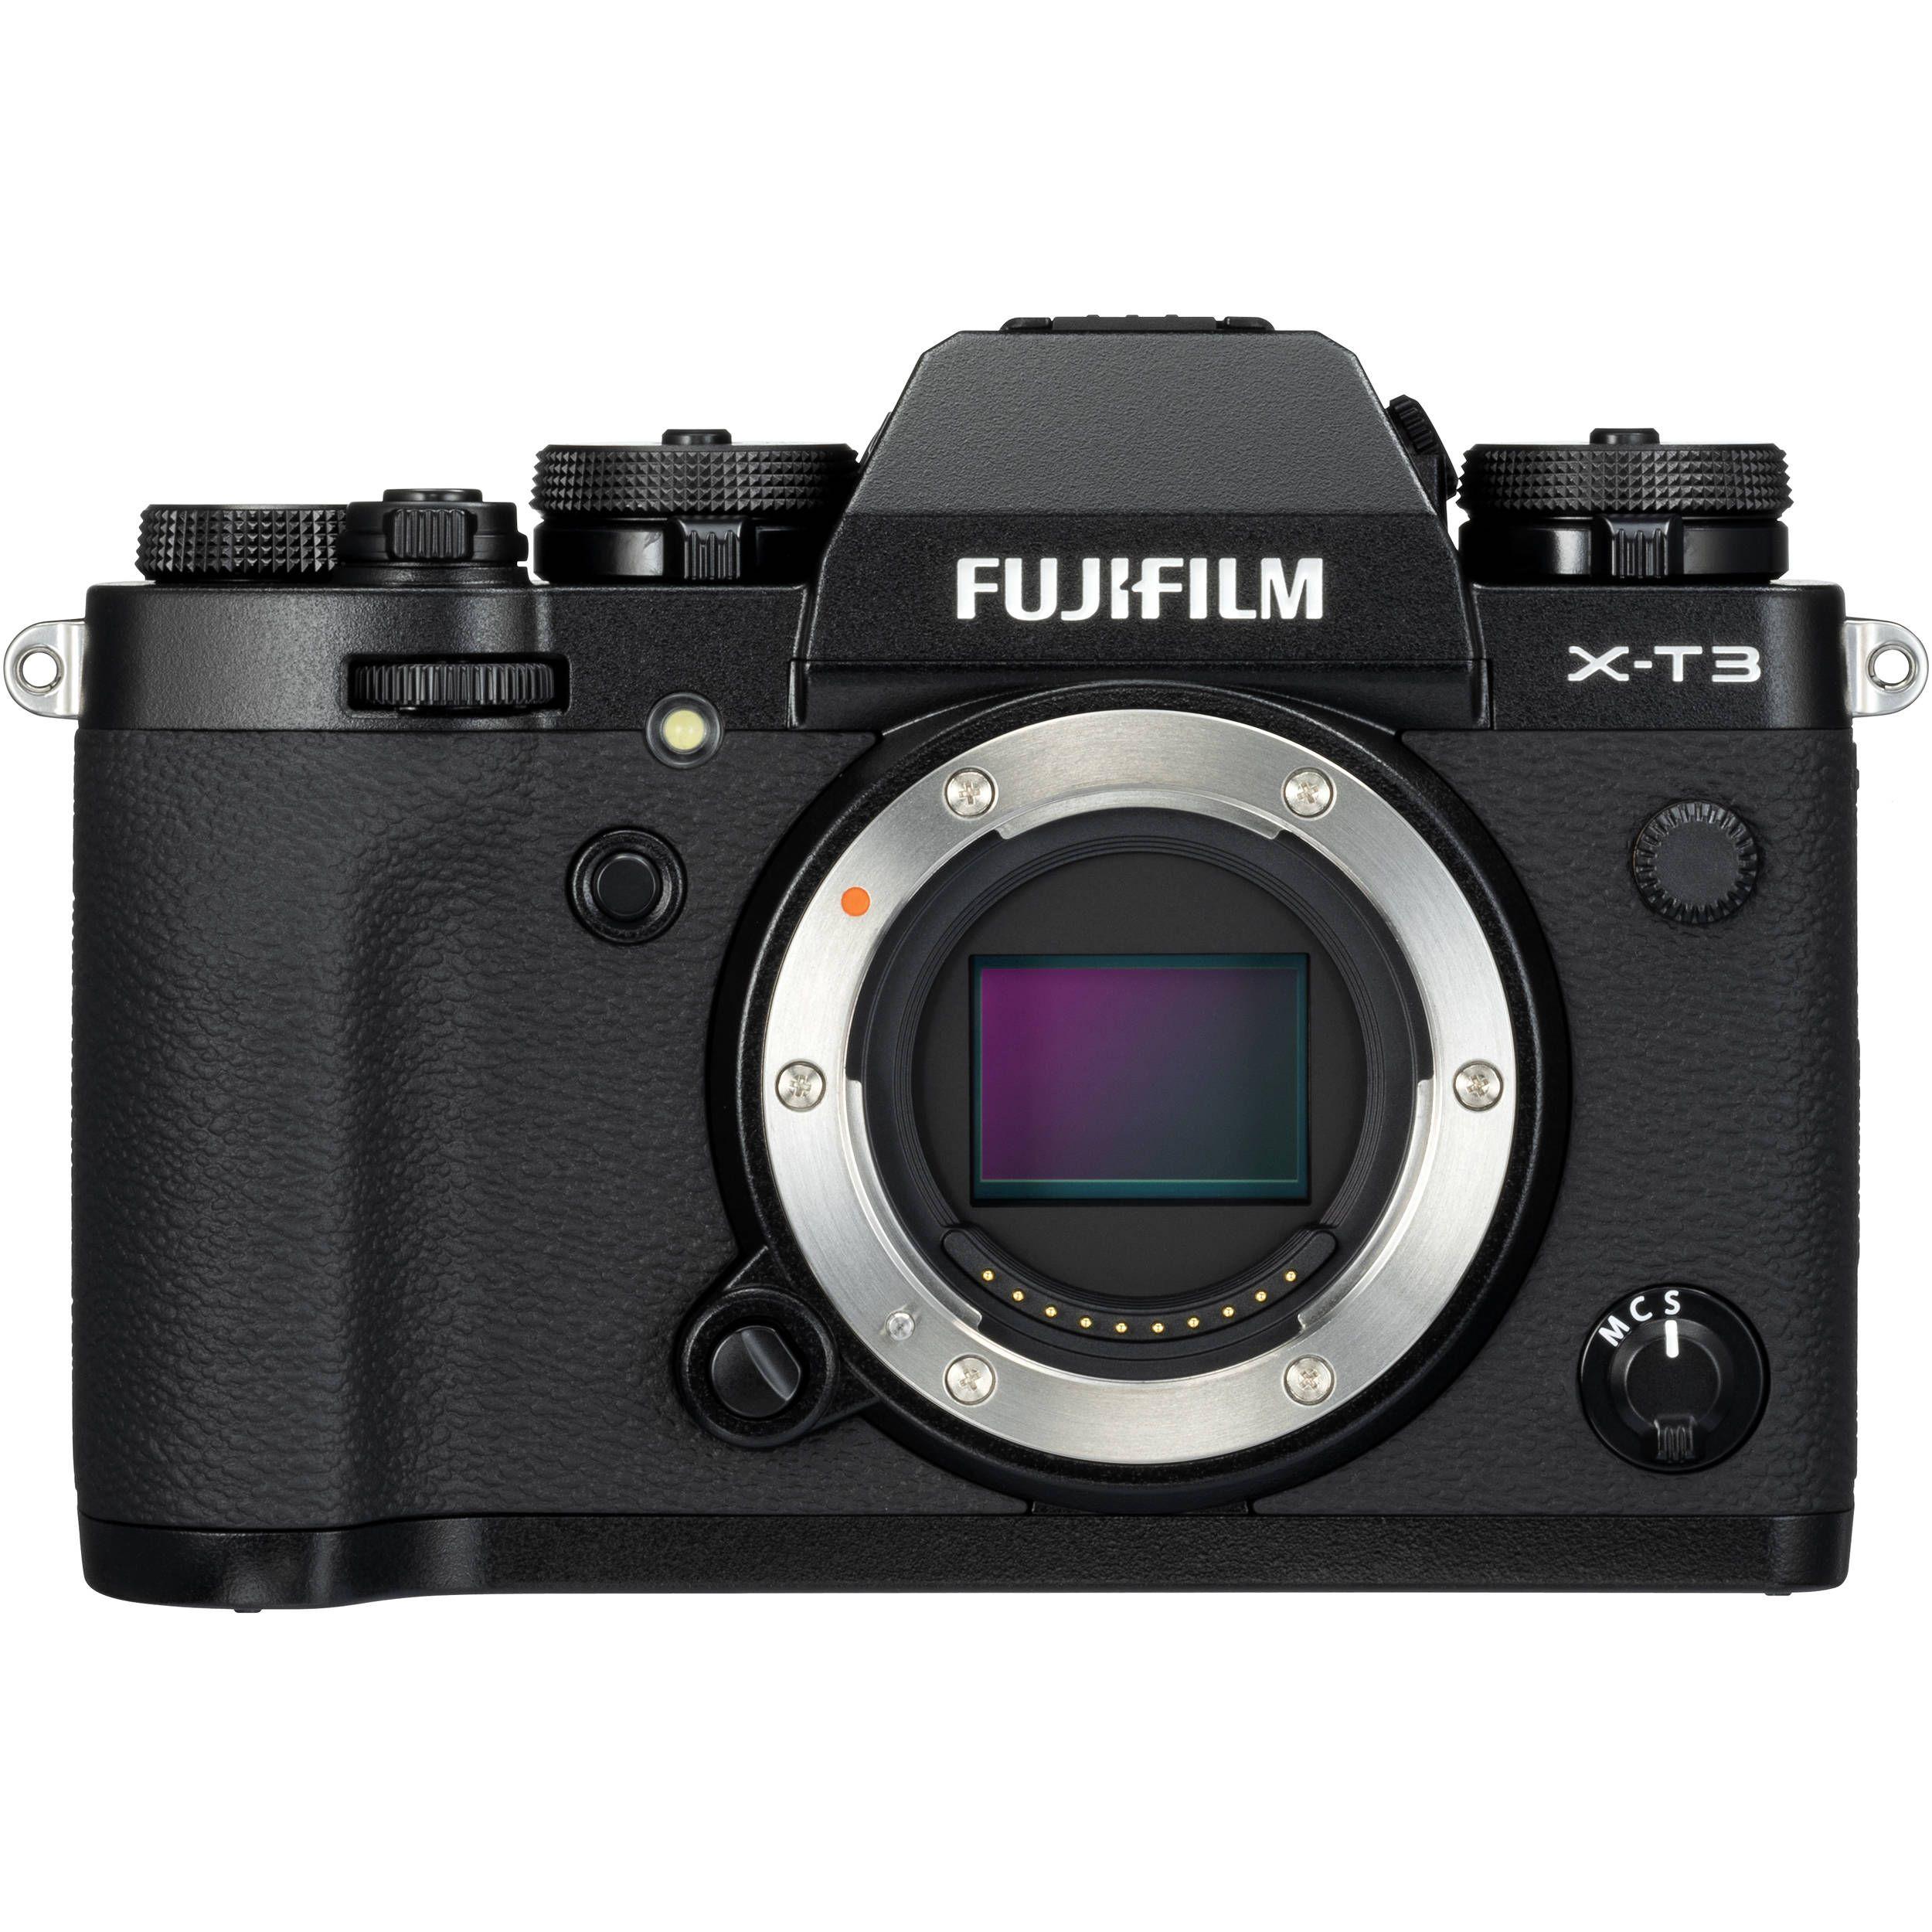 Fujifilm XT3 body + free VPB worth £299. £1099 (Post cashback price £919) @ Wex Photo Video